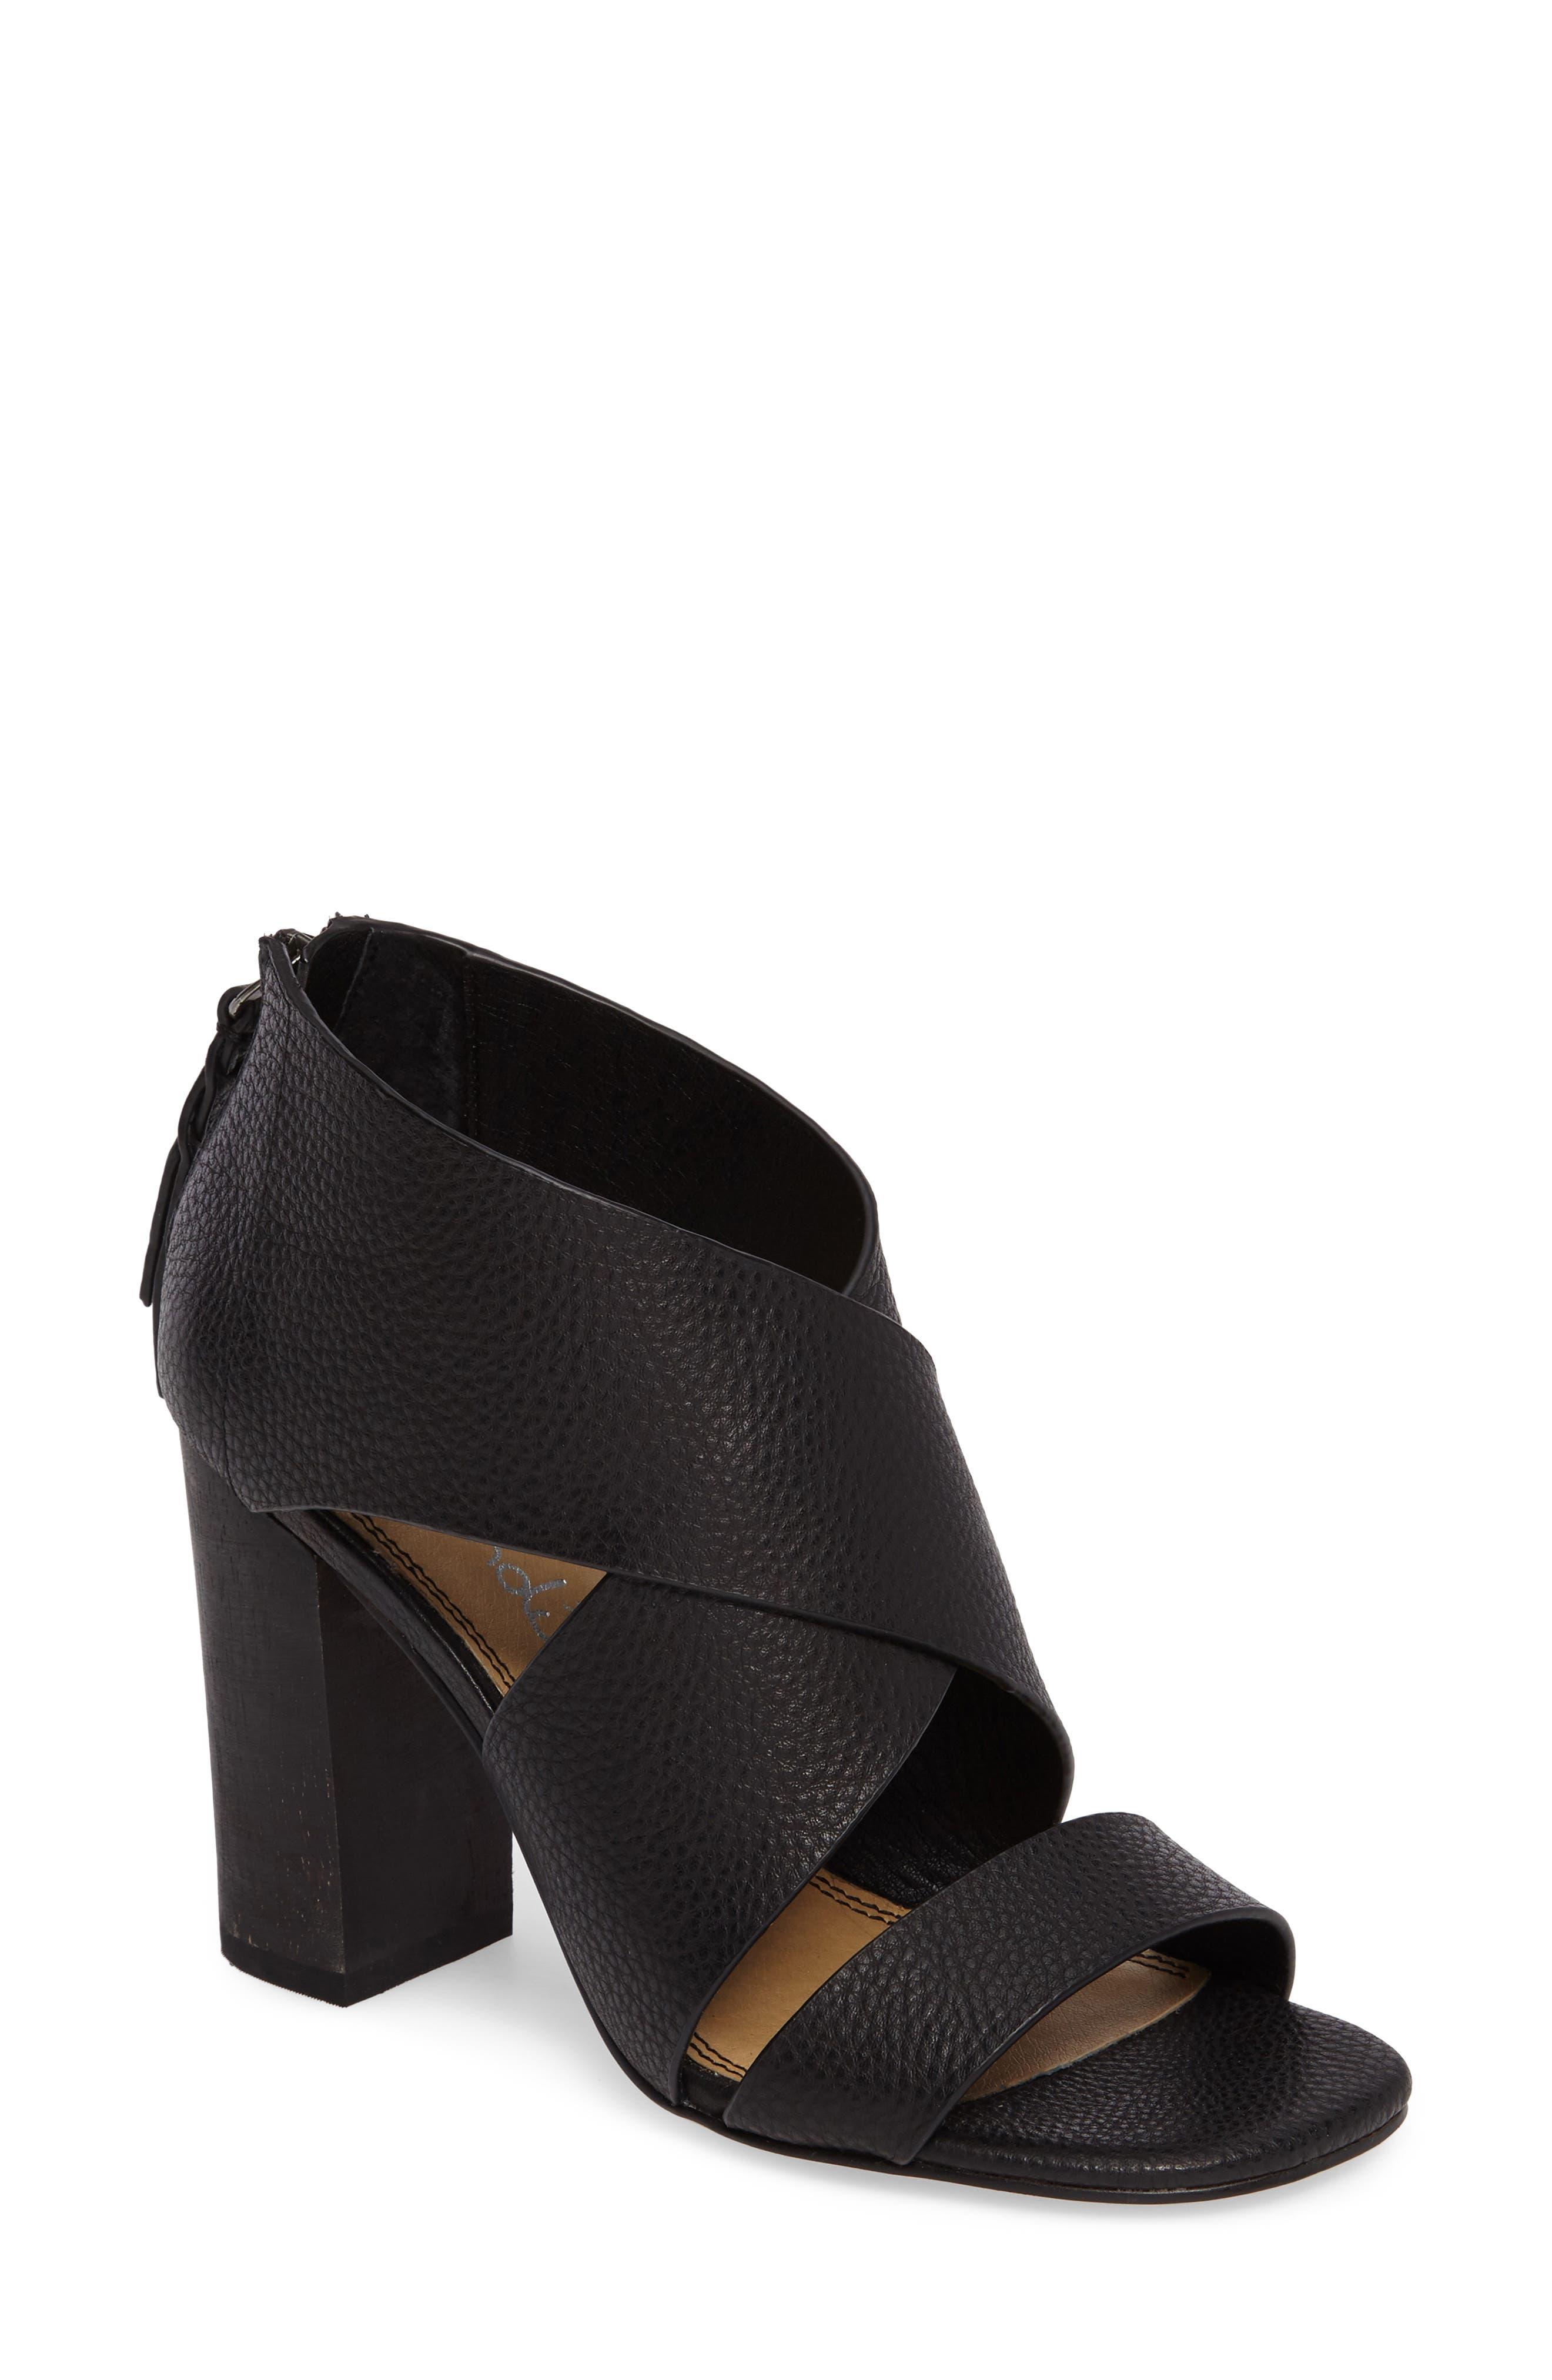 Danett Cross Strap Sandal,                             Main thumbnail 1, color,                             Black Leather